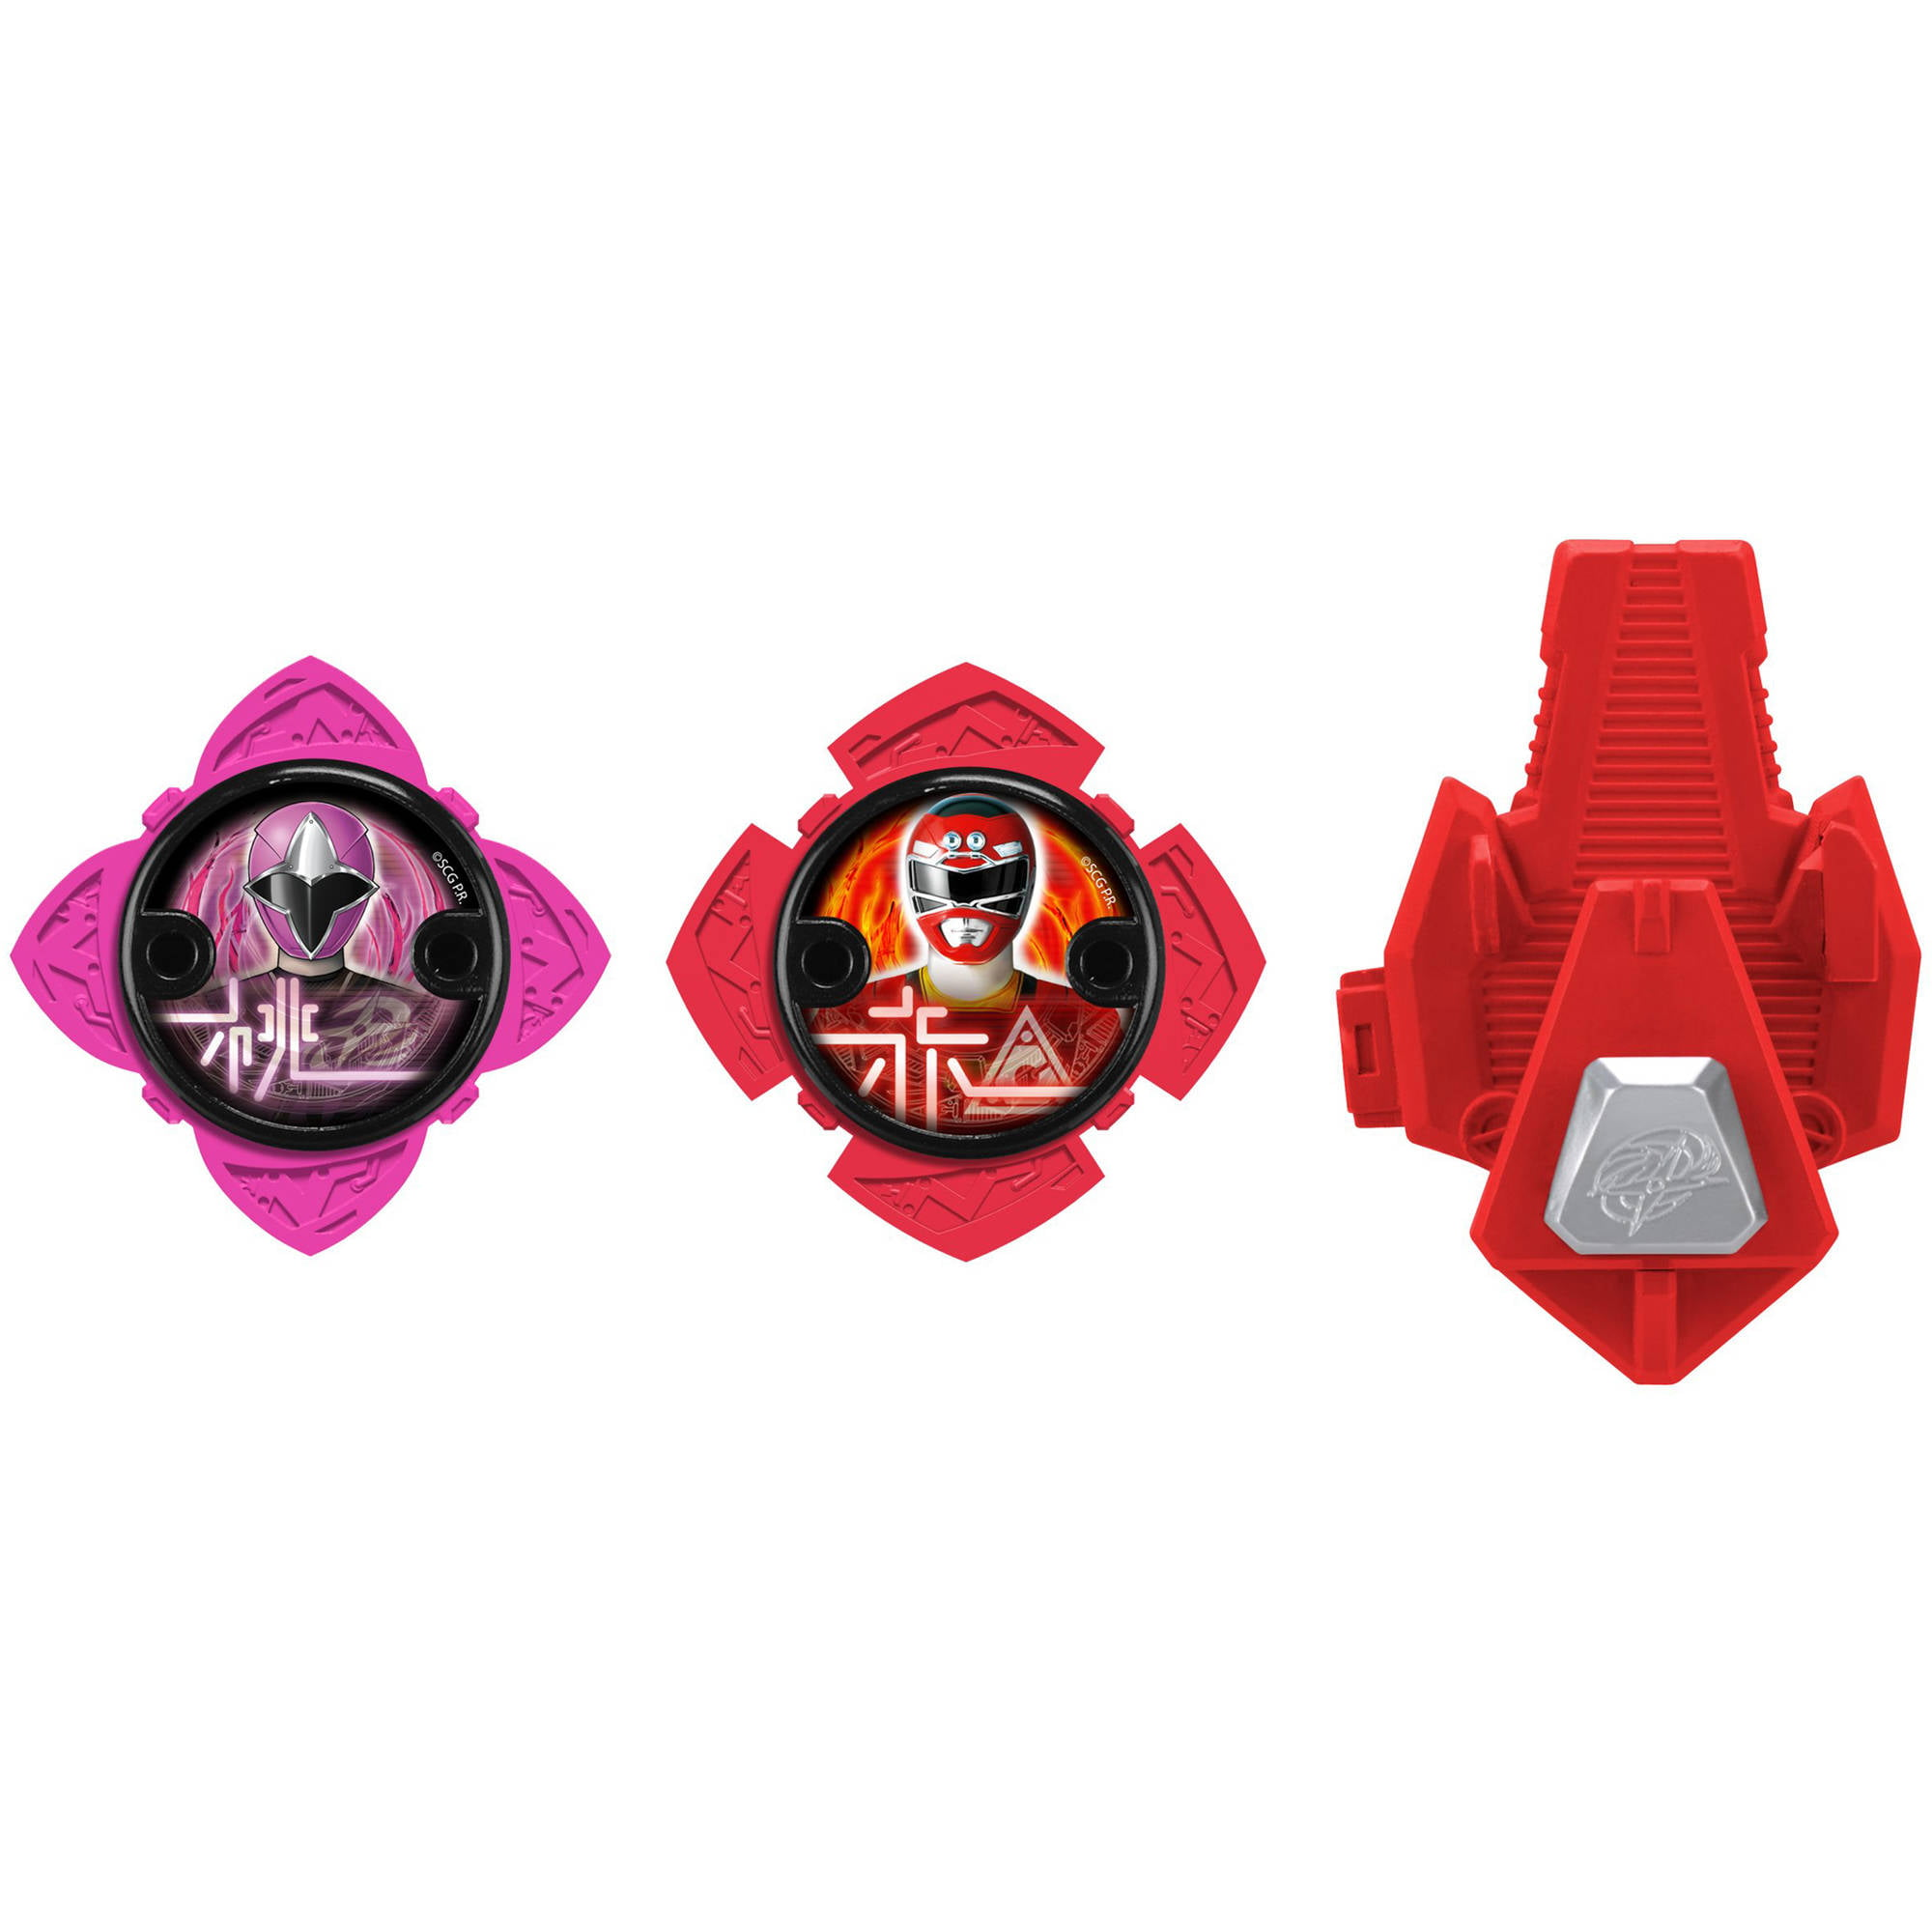 Power Rangers Ninja Steel Ninja Power Star Pack, 43755 by Bandai America, Inc